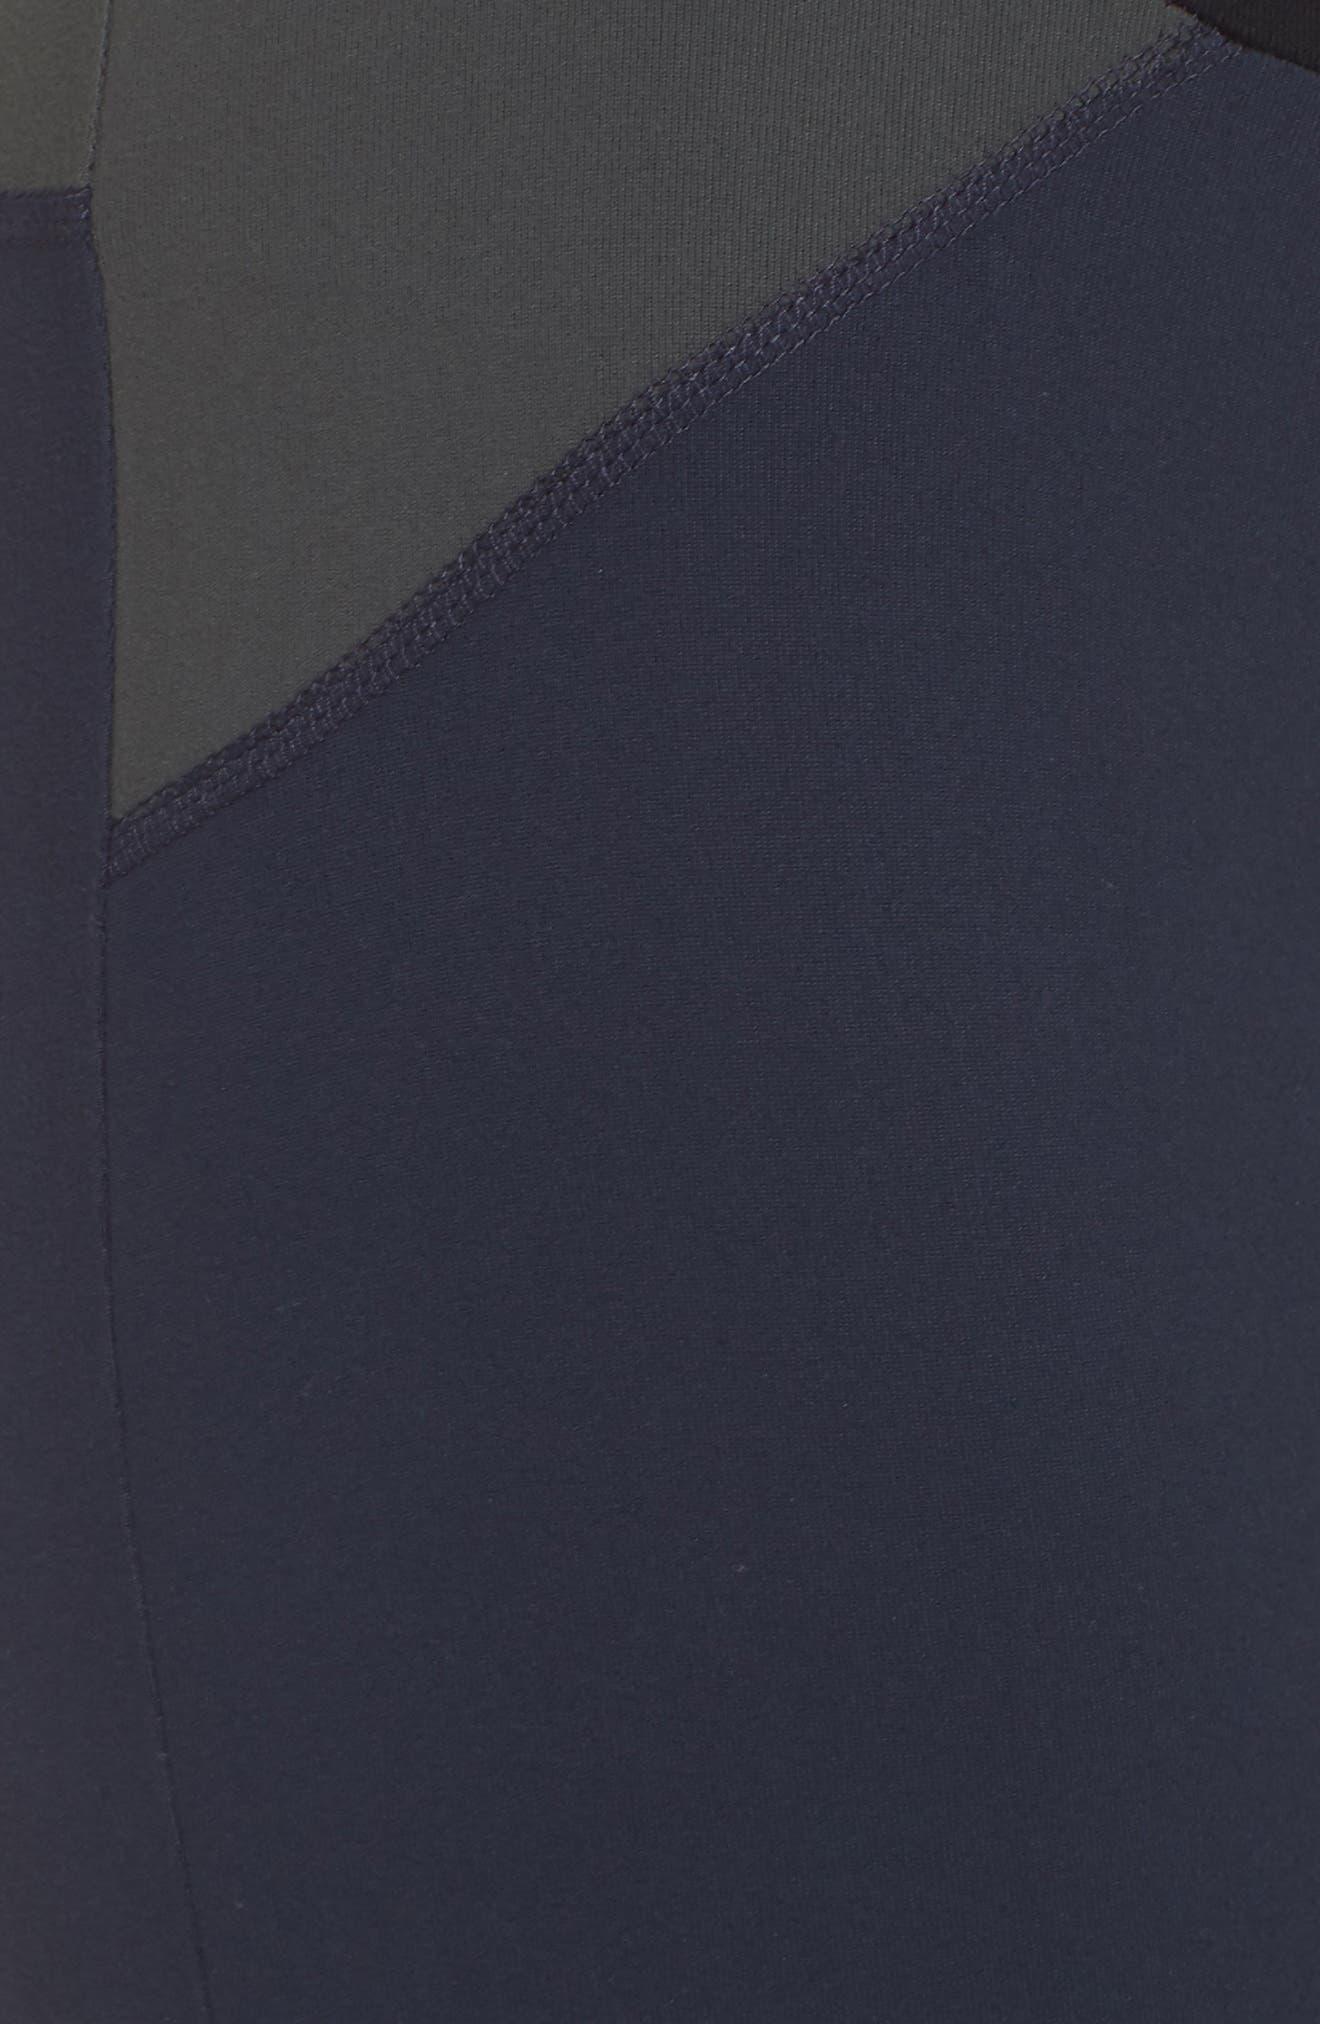 BoomBoom Athletica Brushed Tricolor Panel Leggings,                             Alternate thumbnail 6, color,                             NAVY/ BLACK/ GREEN